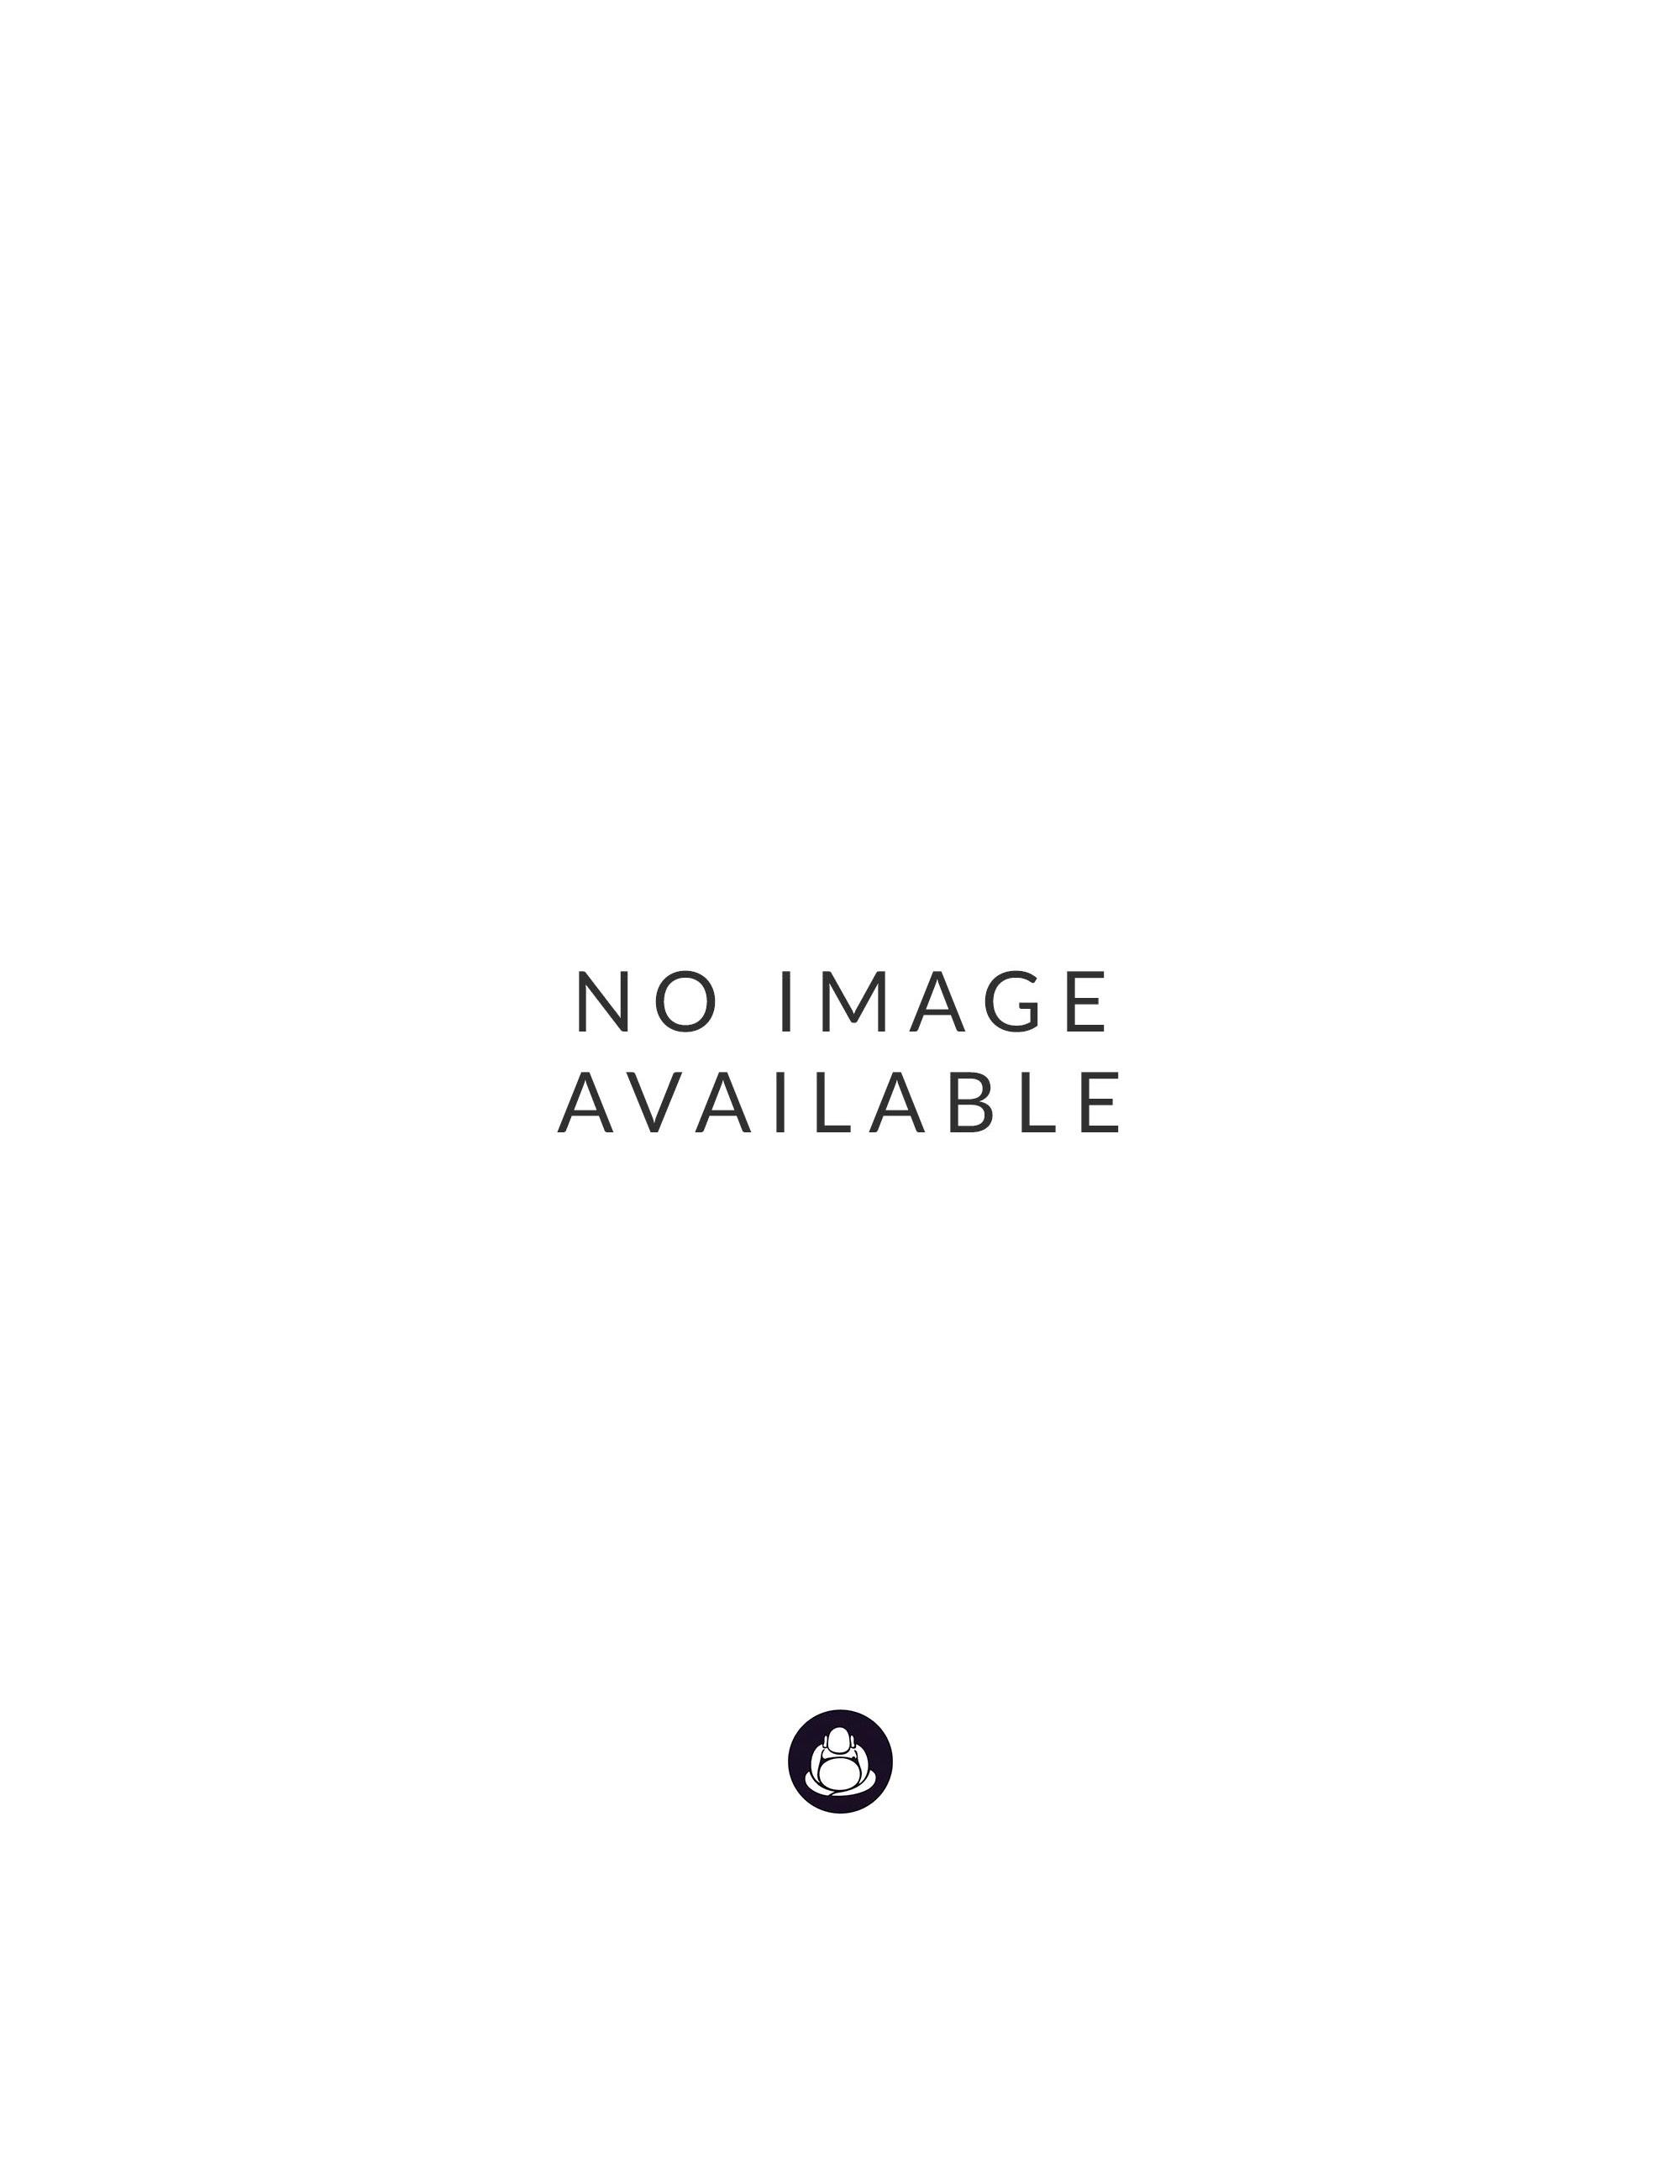 Proraso Shaving Cream Tube - Shea Butter (150ml)